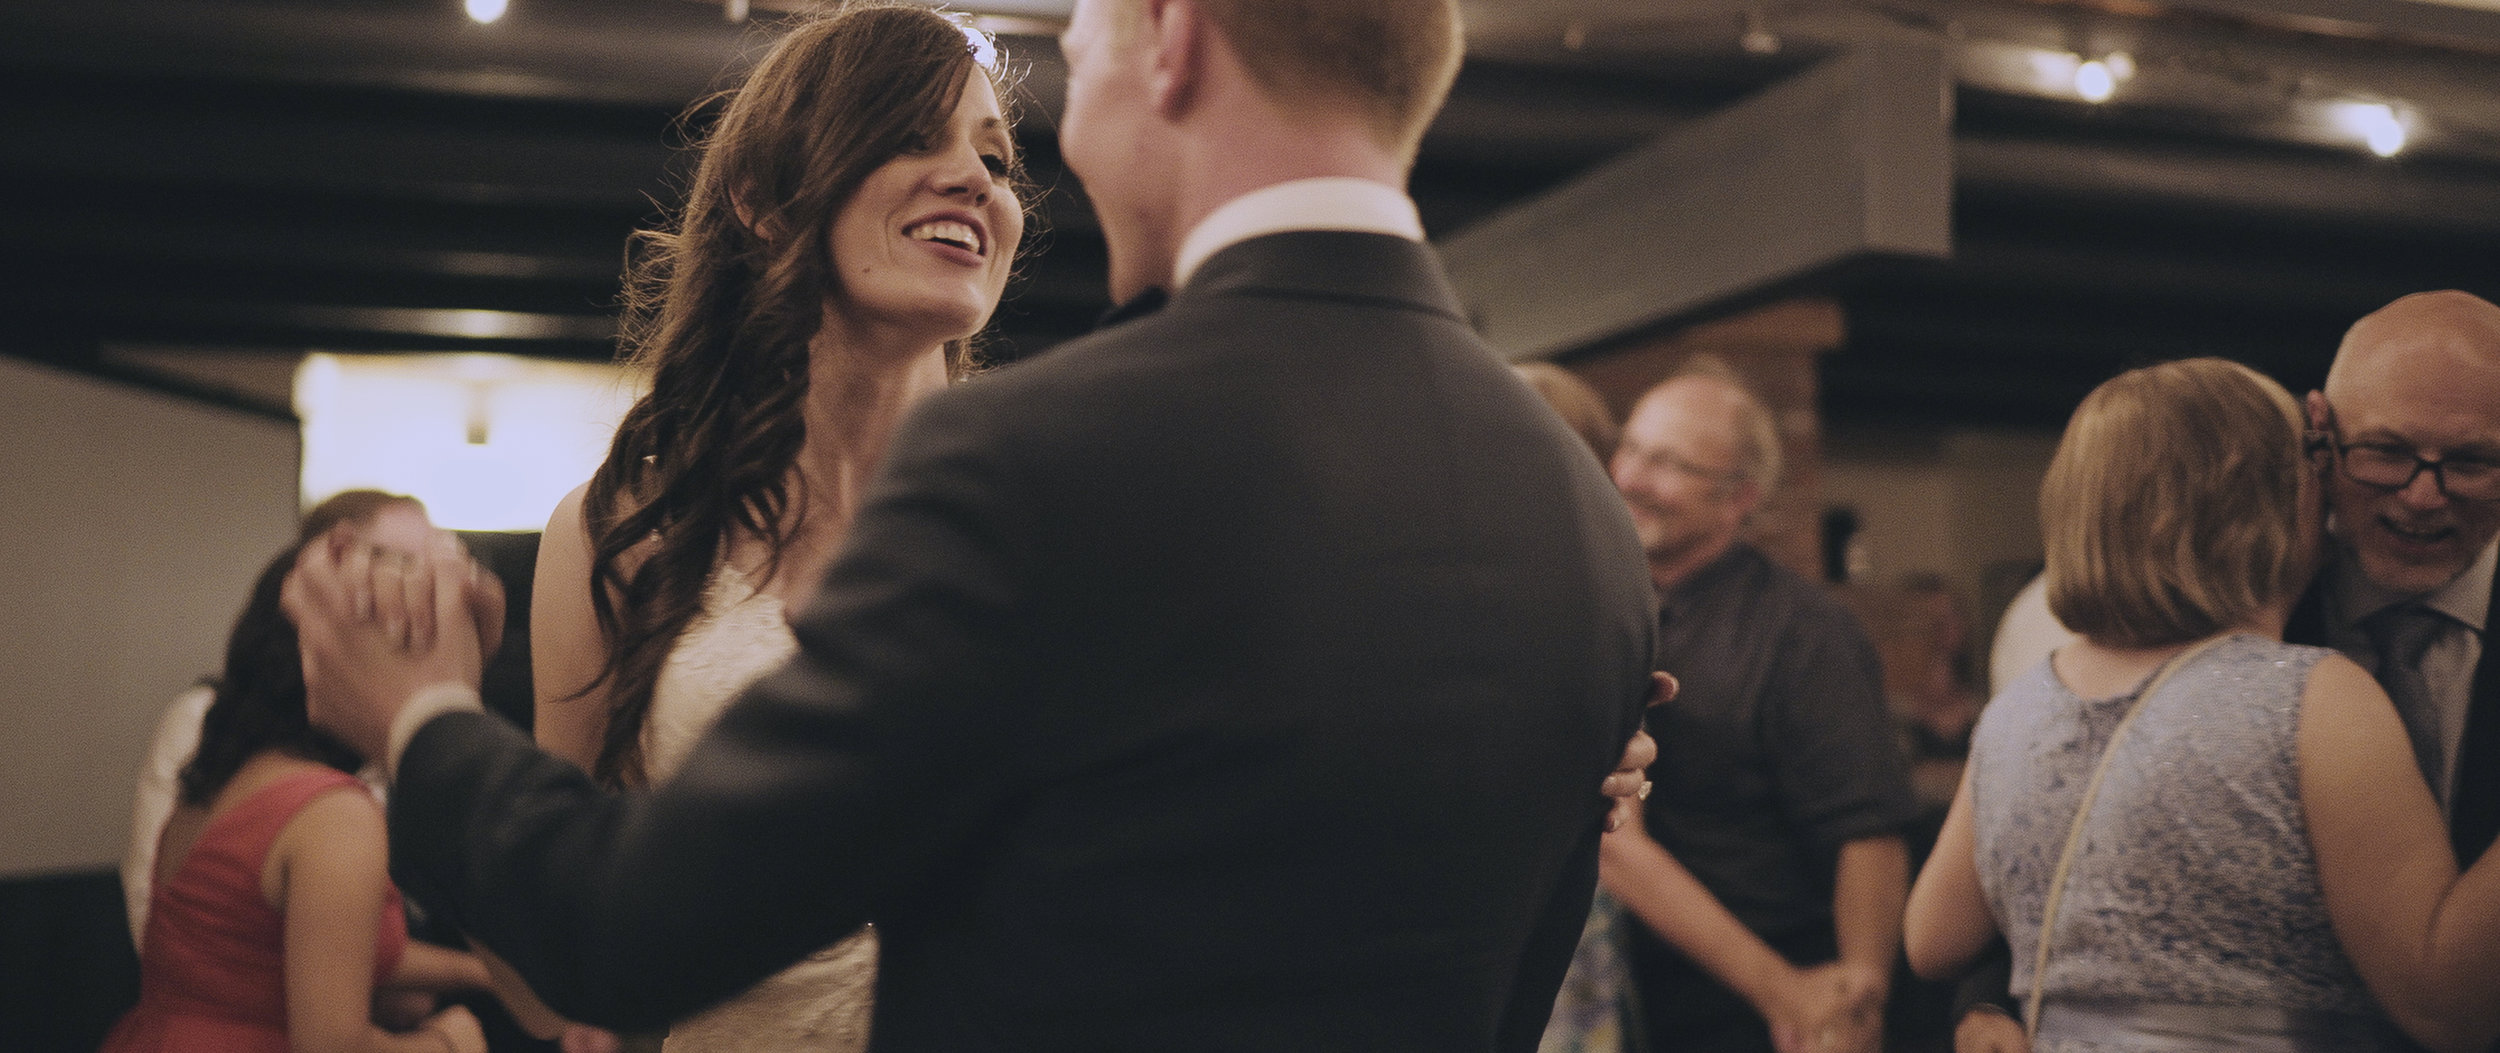 BC Wedding Videography-5.jpg